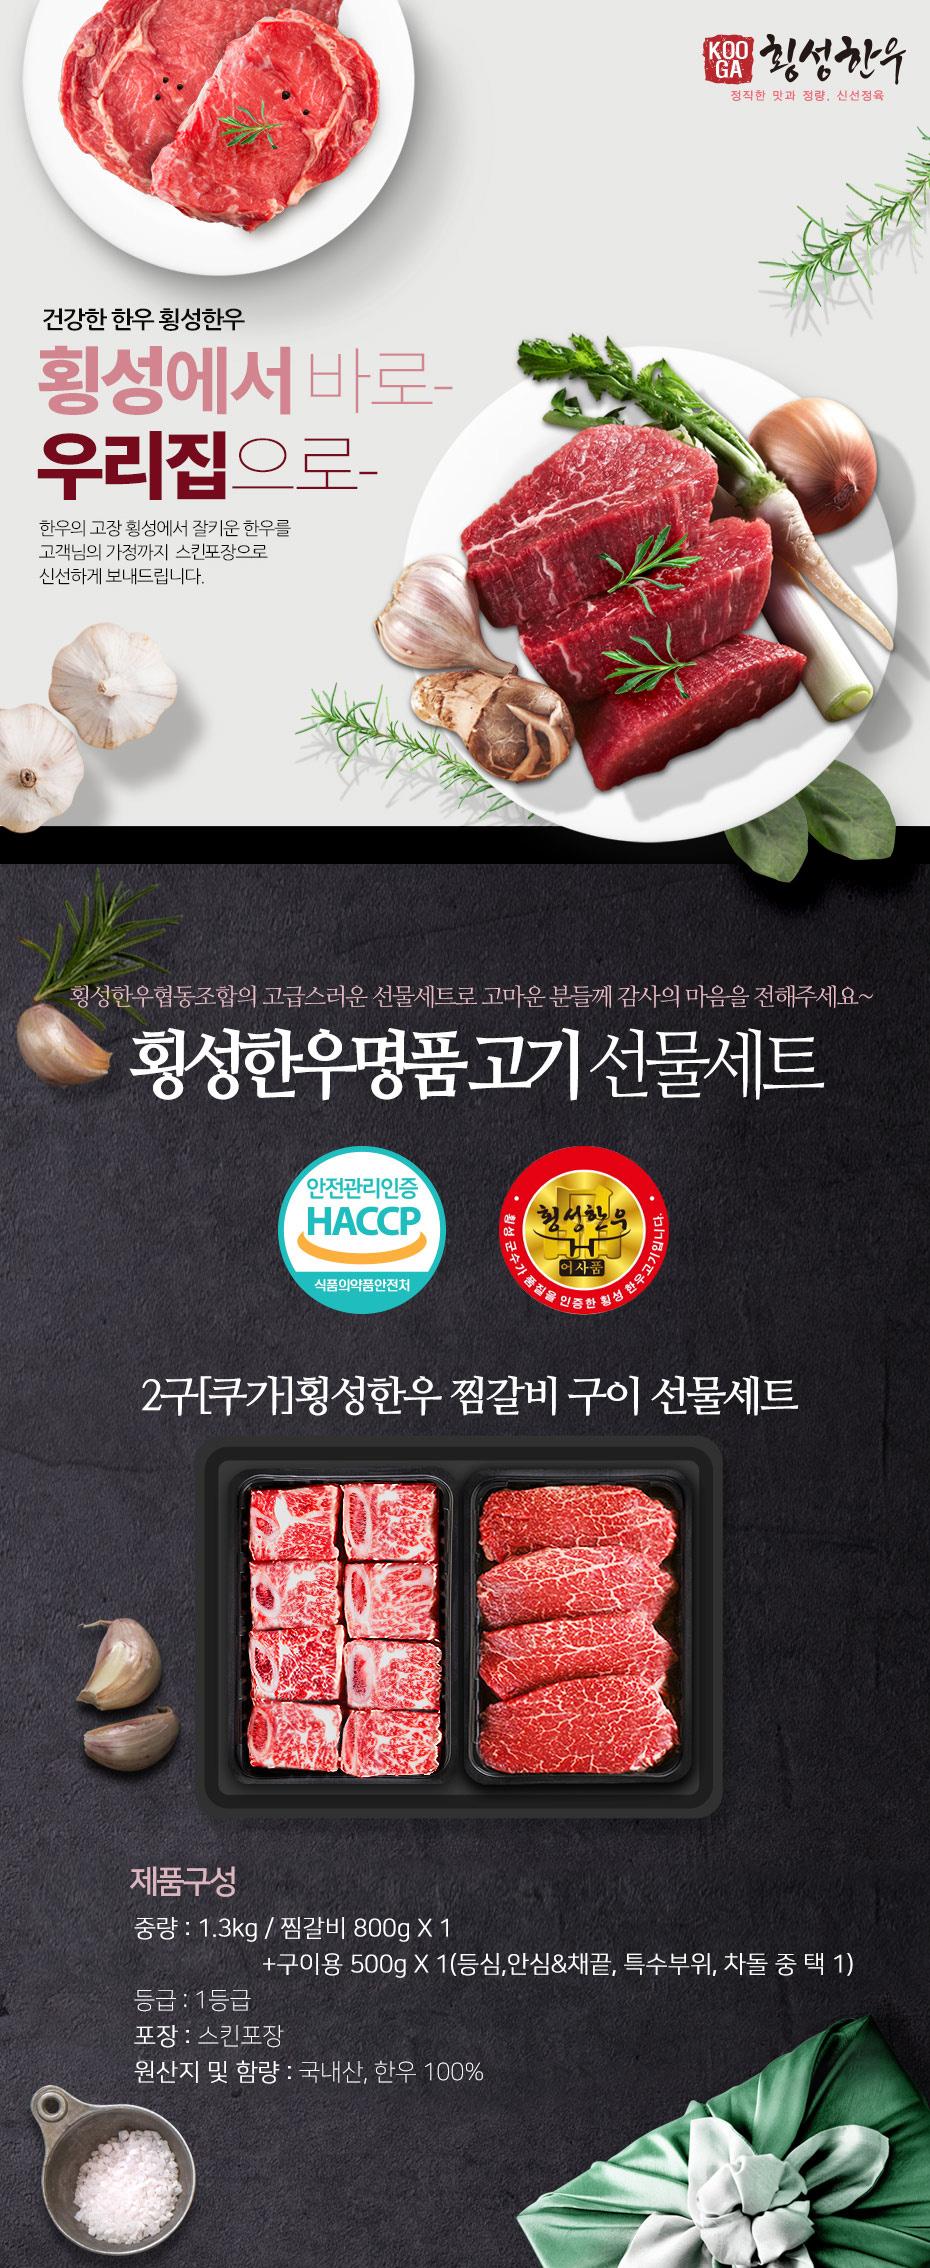 set2_meat_rib_ten_014549.jpg